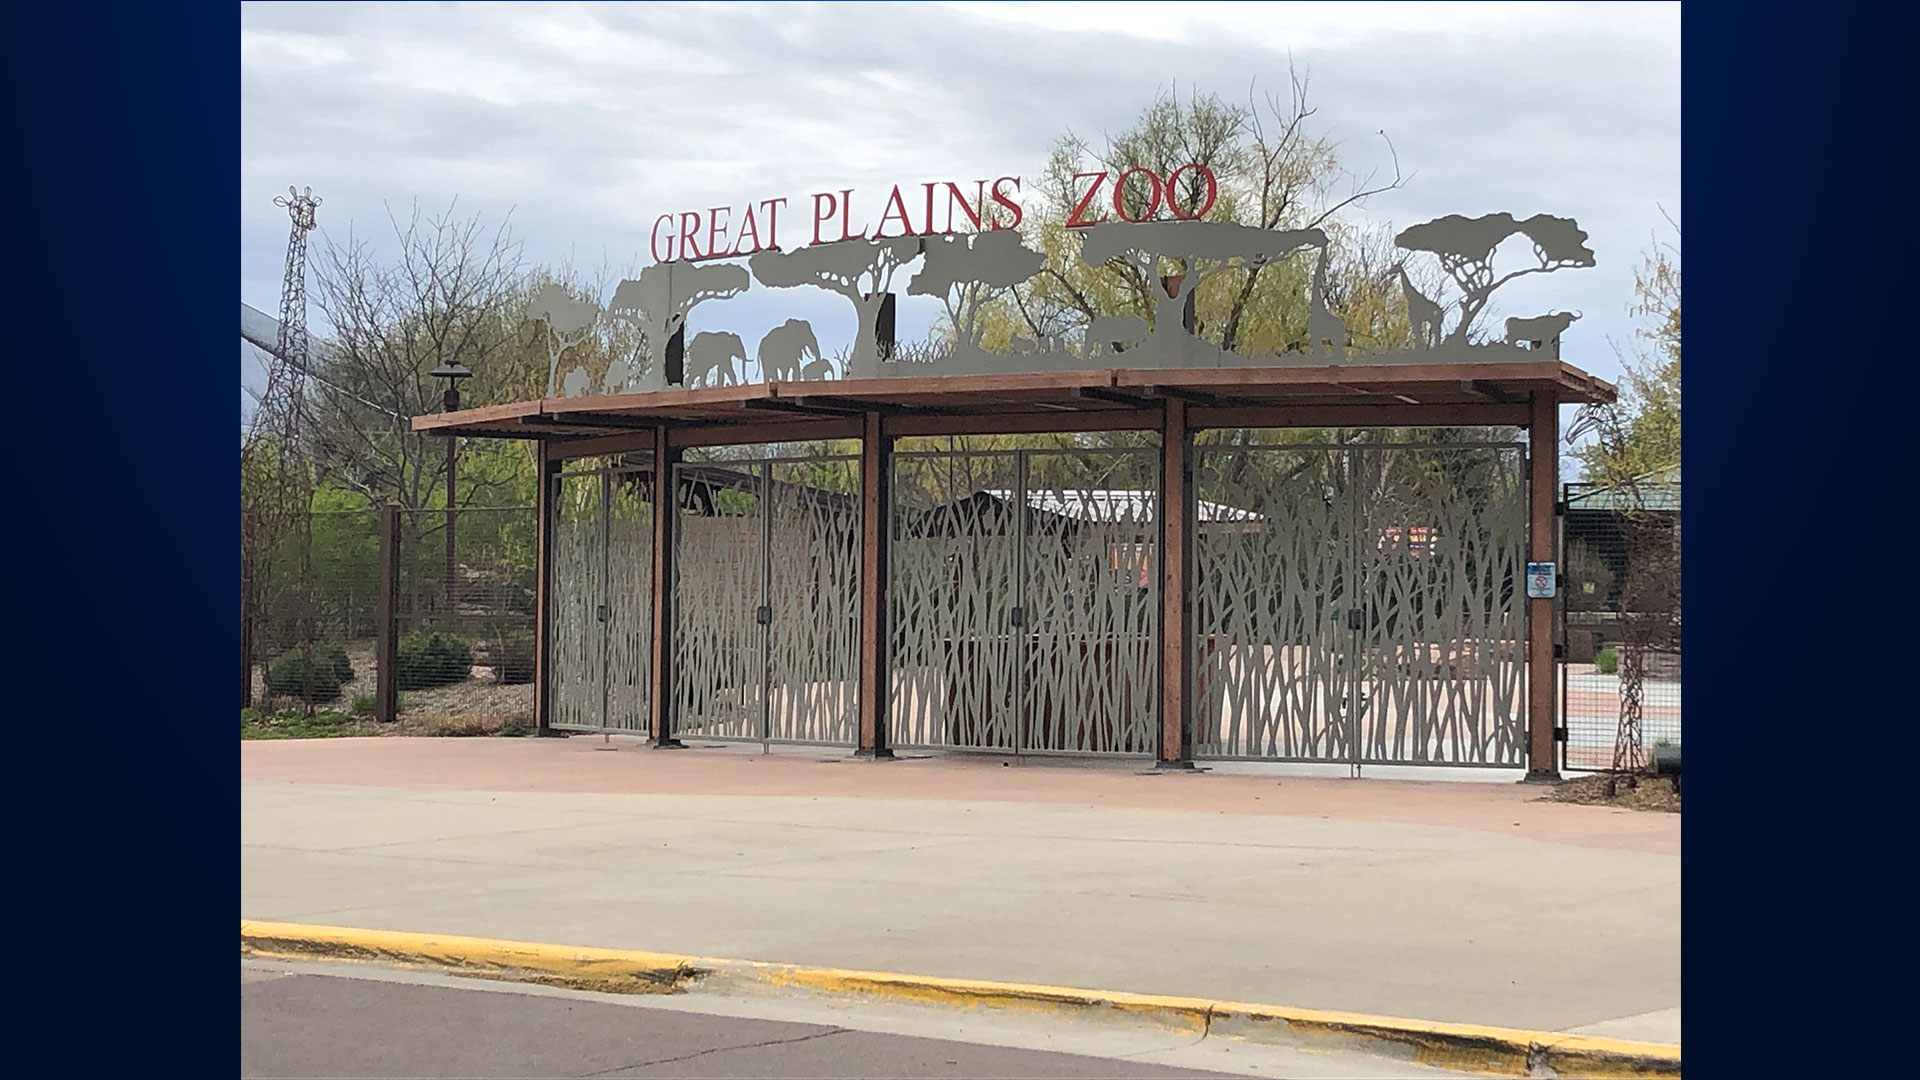 KELO Great Plains Zoo